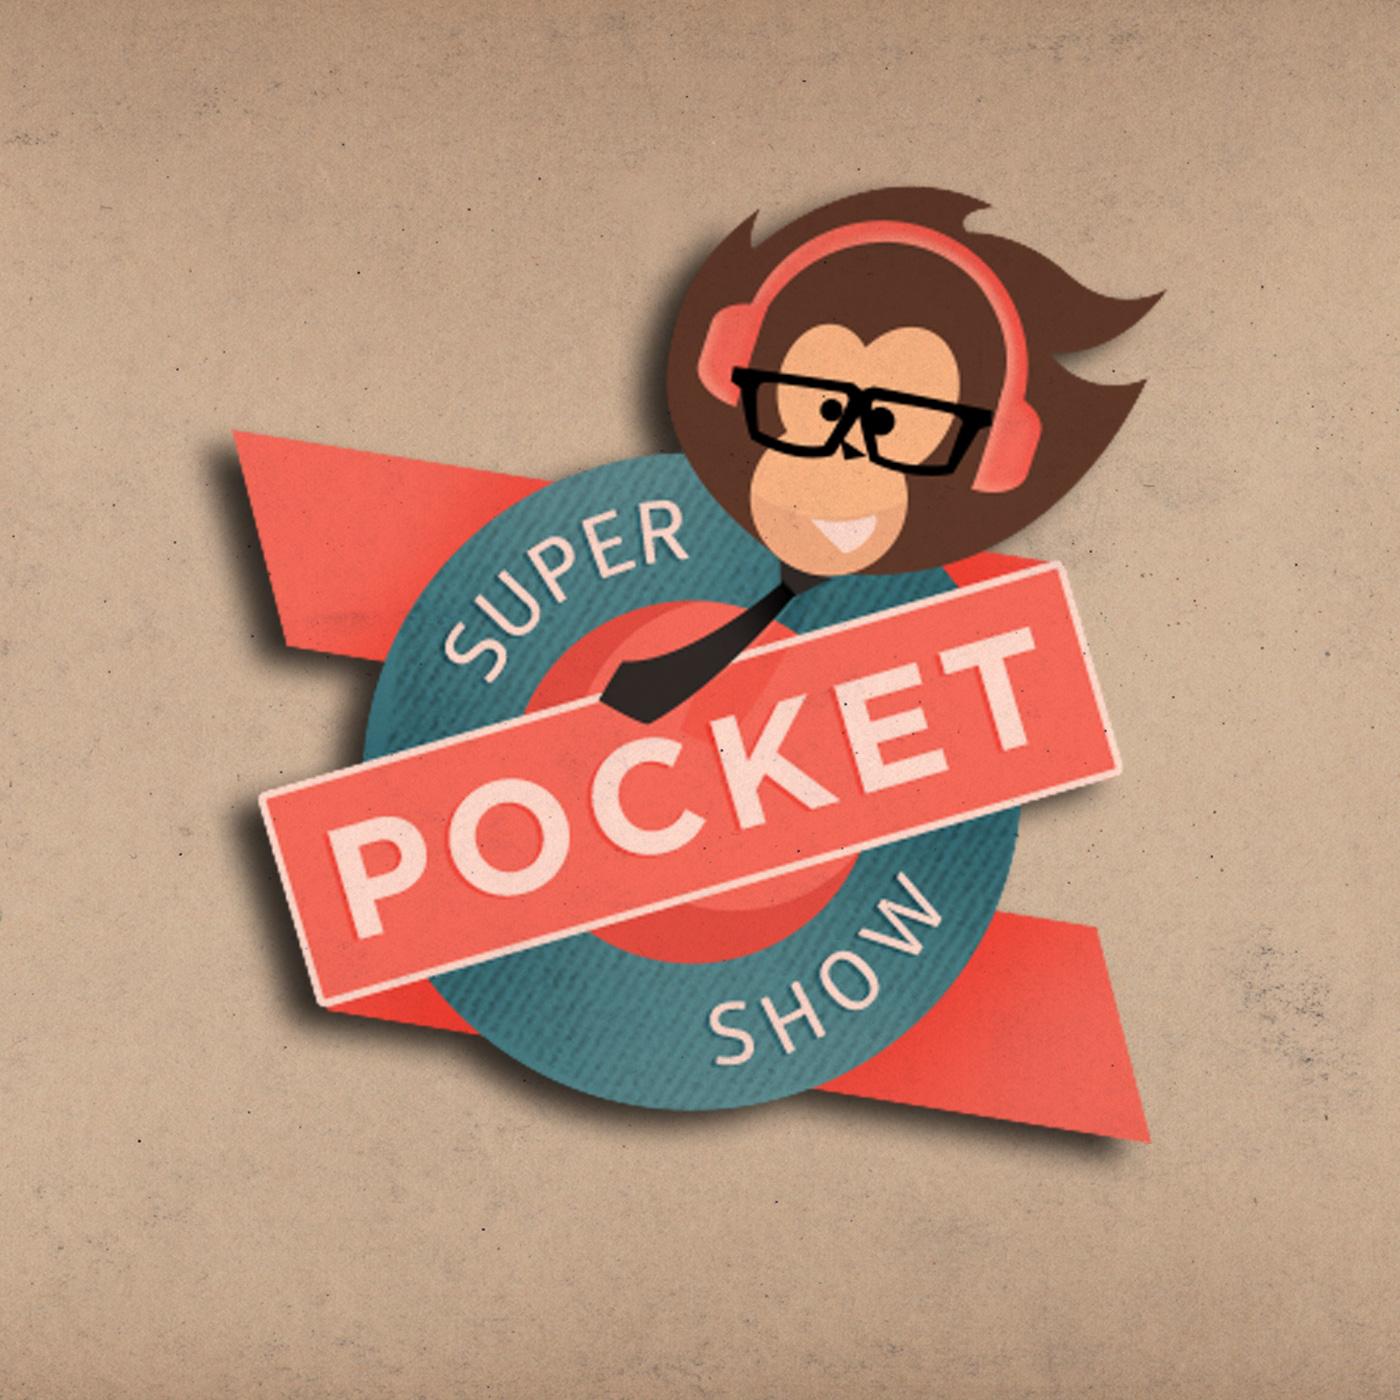 Super Pocket Show